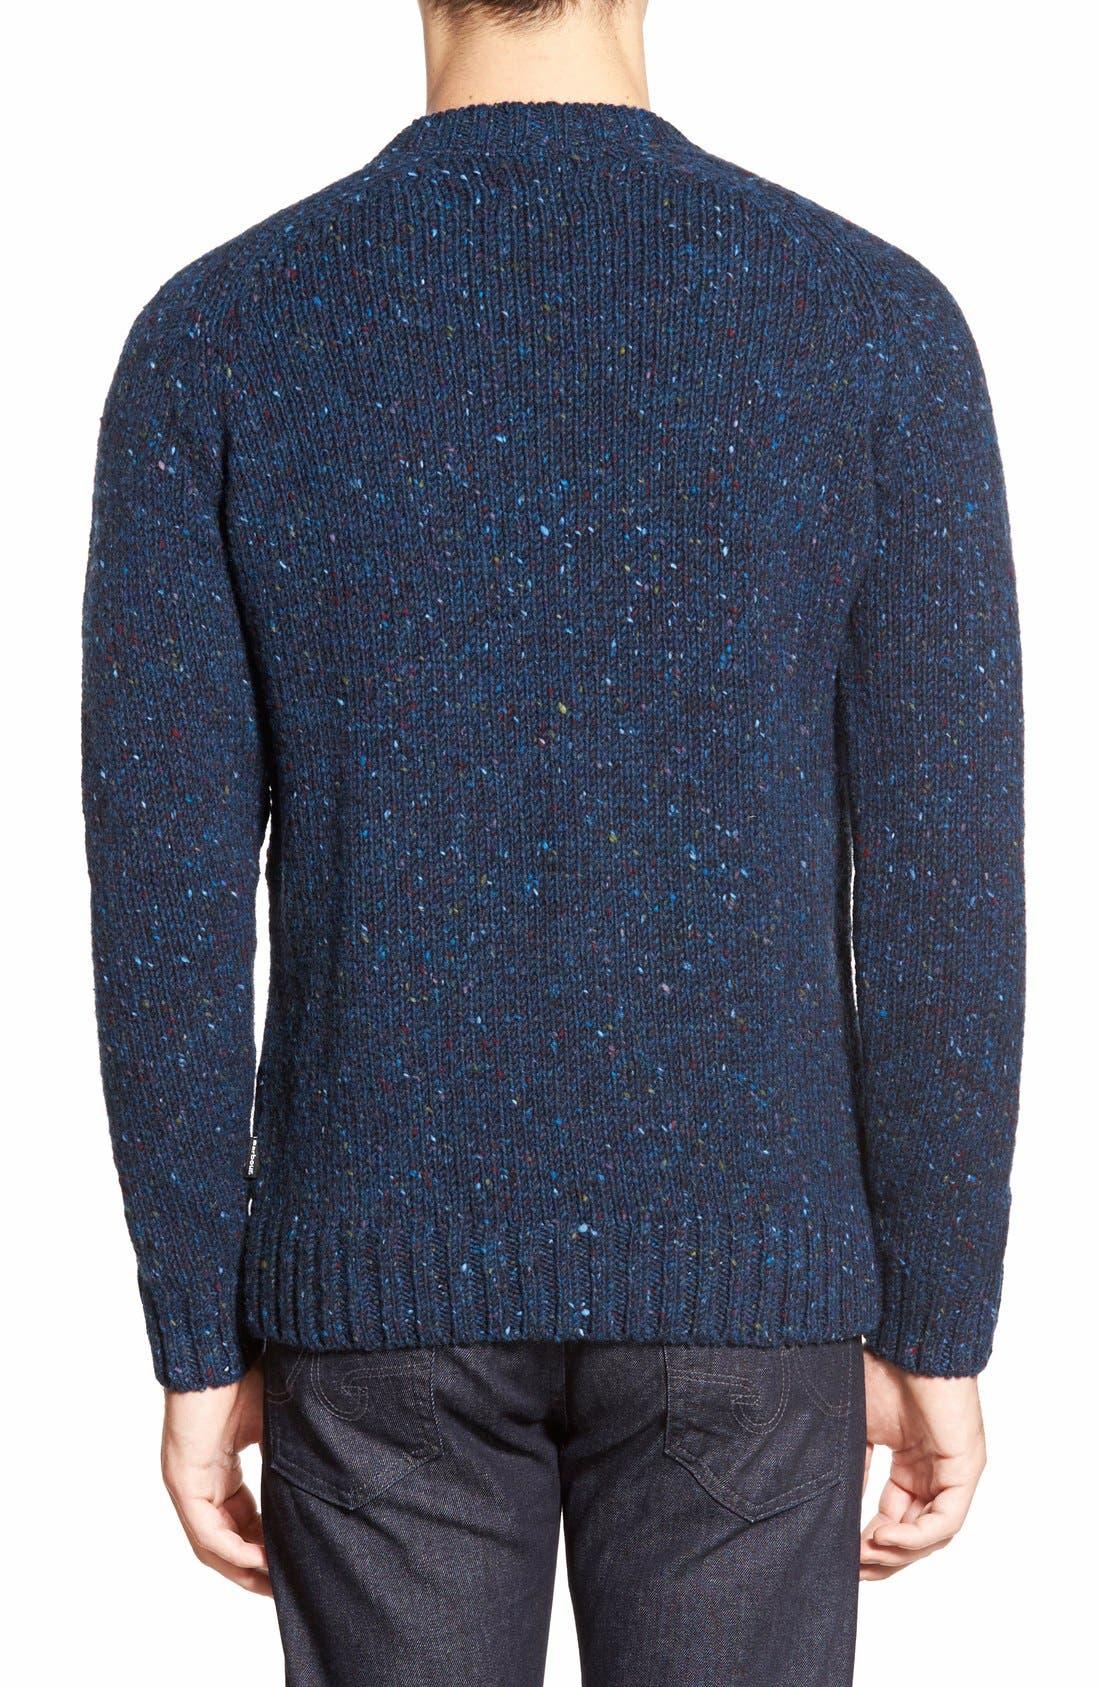 'Netherby' Kilcara Tweed Crewneck Sweater,                             Alternate thumbnail 2, color,                             400